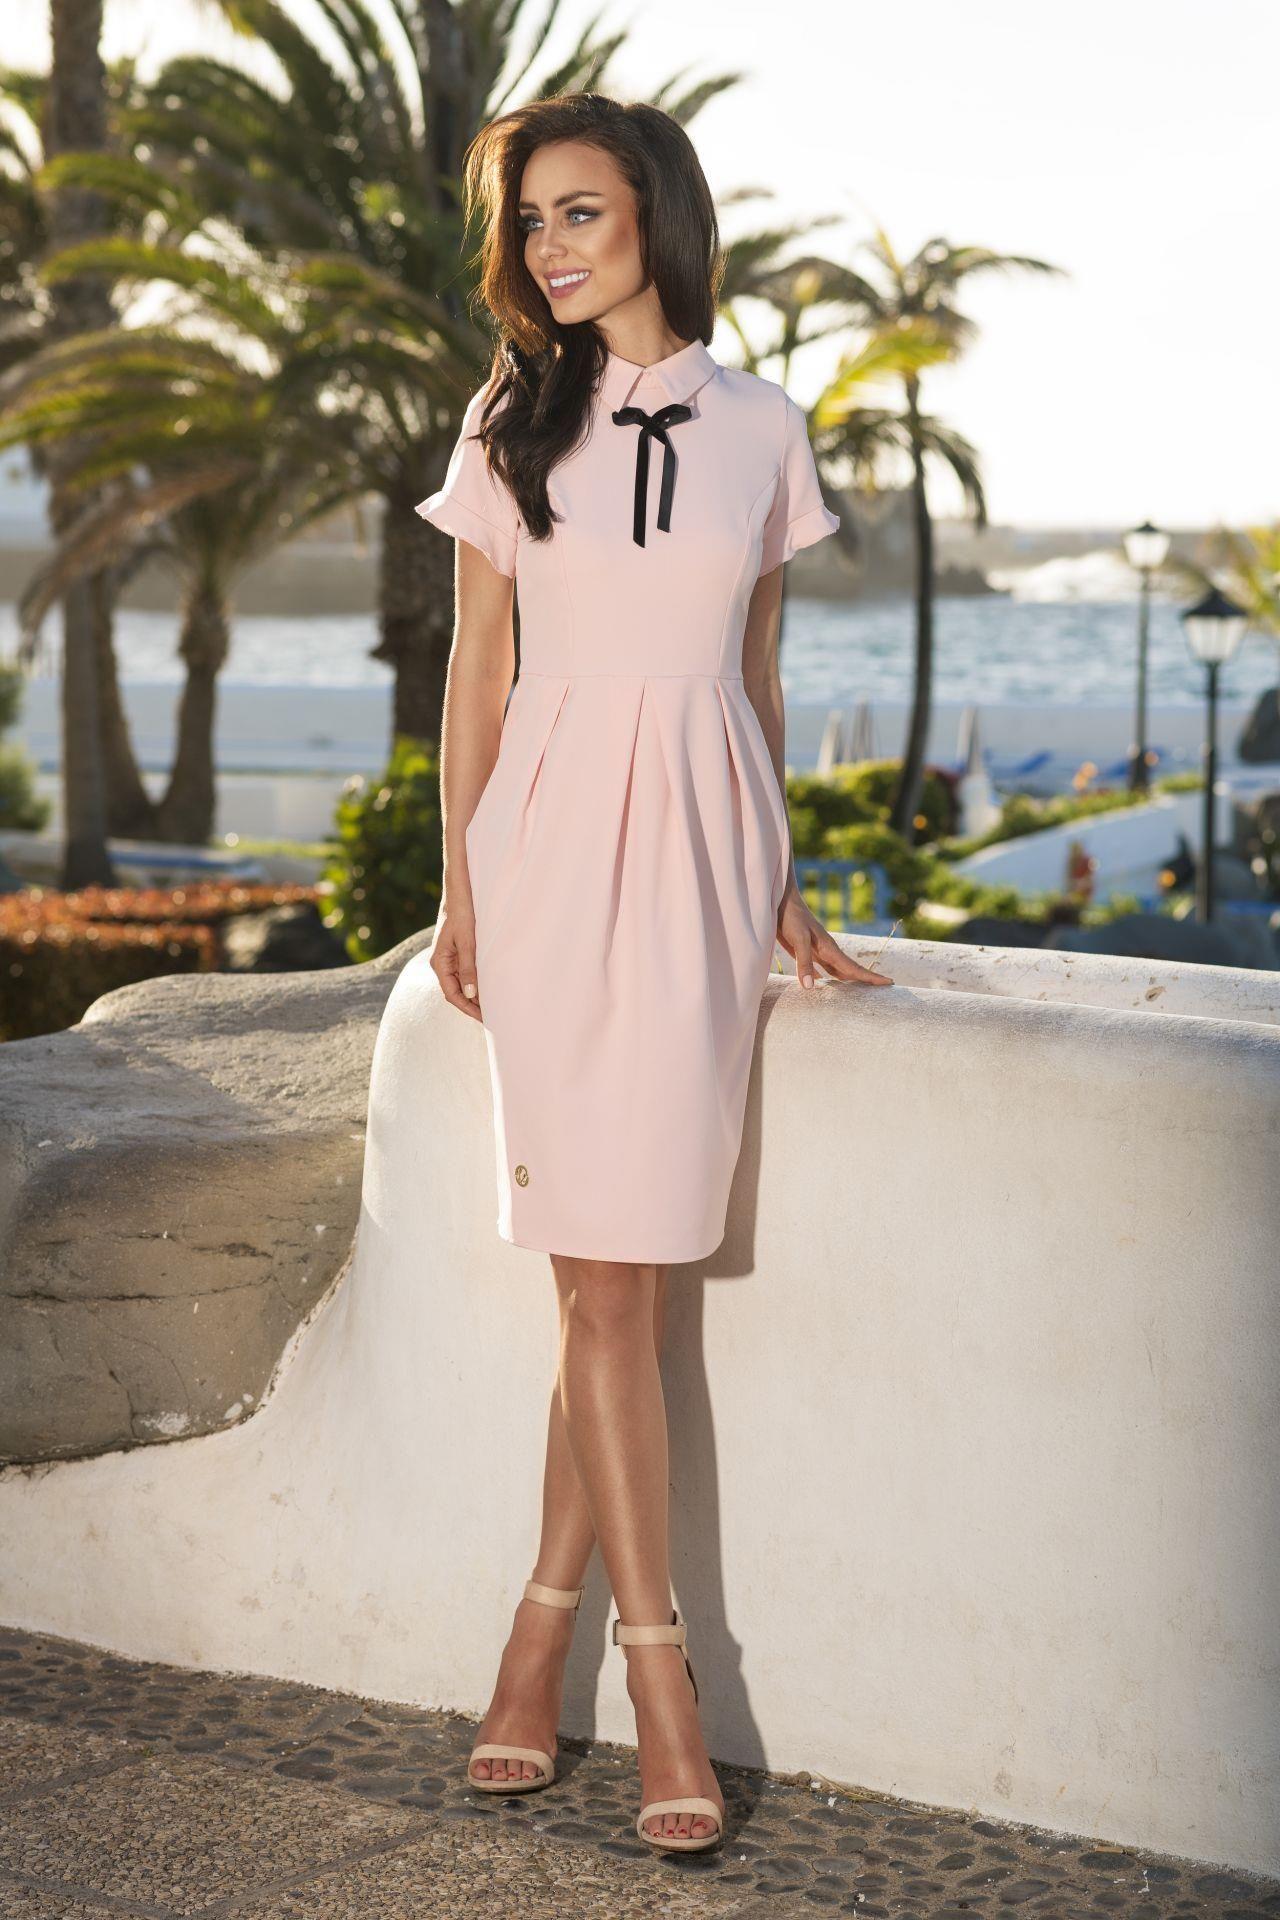 bf27b4fd46 Lemoniade Modna elegancka sukienka L234 - Ceny i opinie - Ceneo.pl